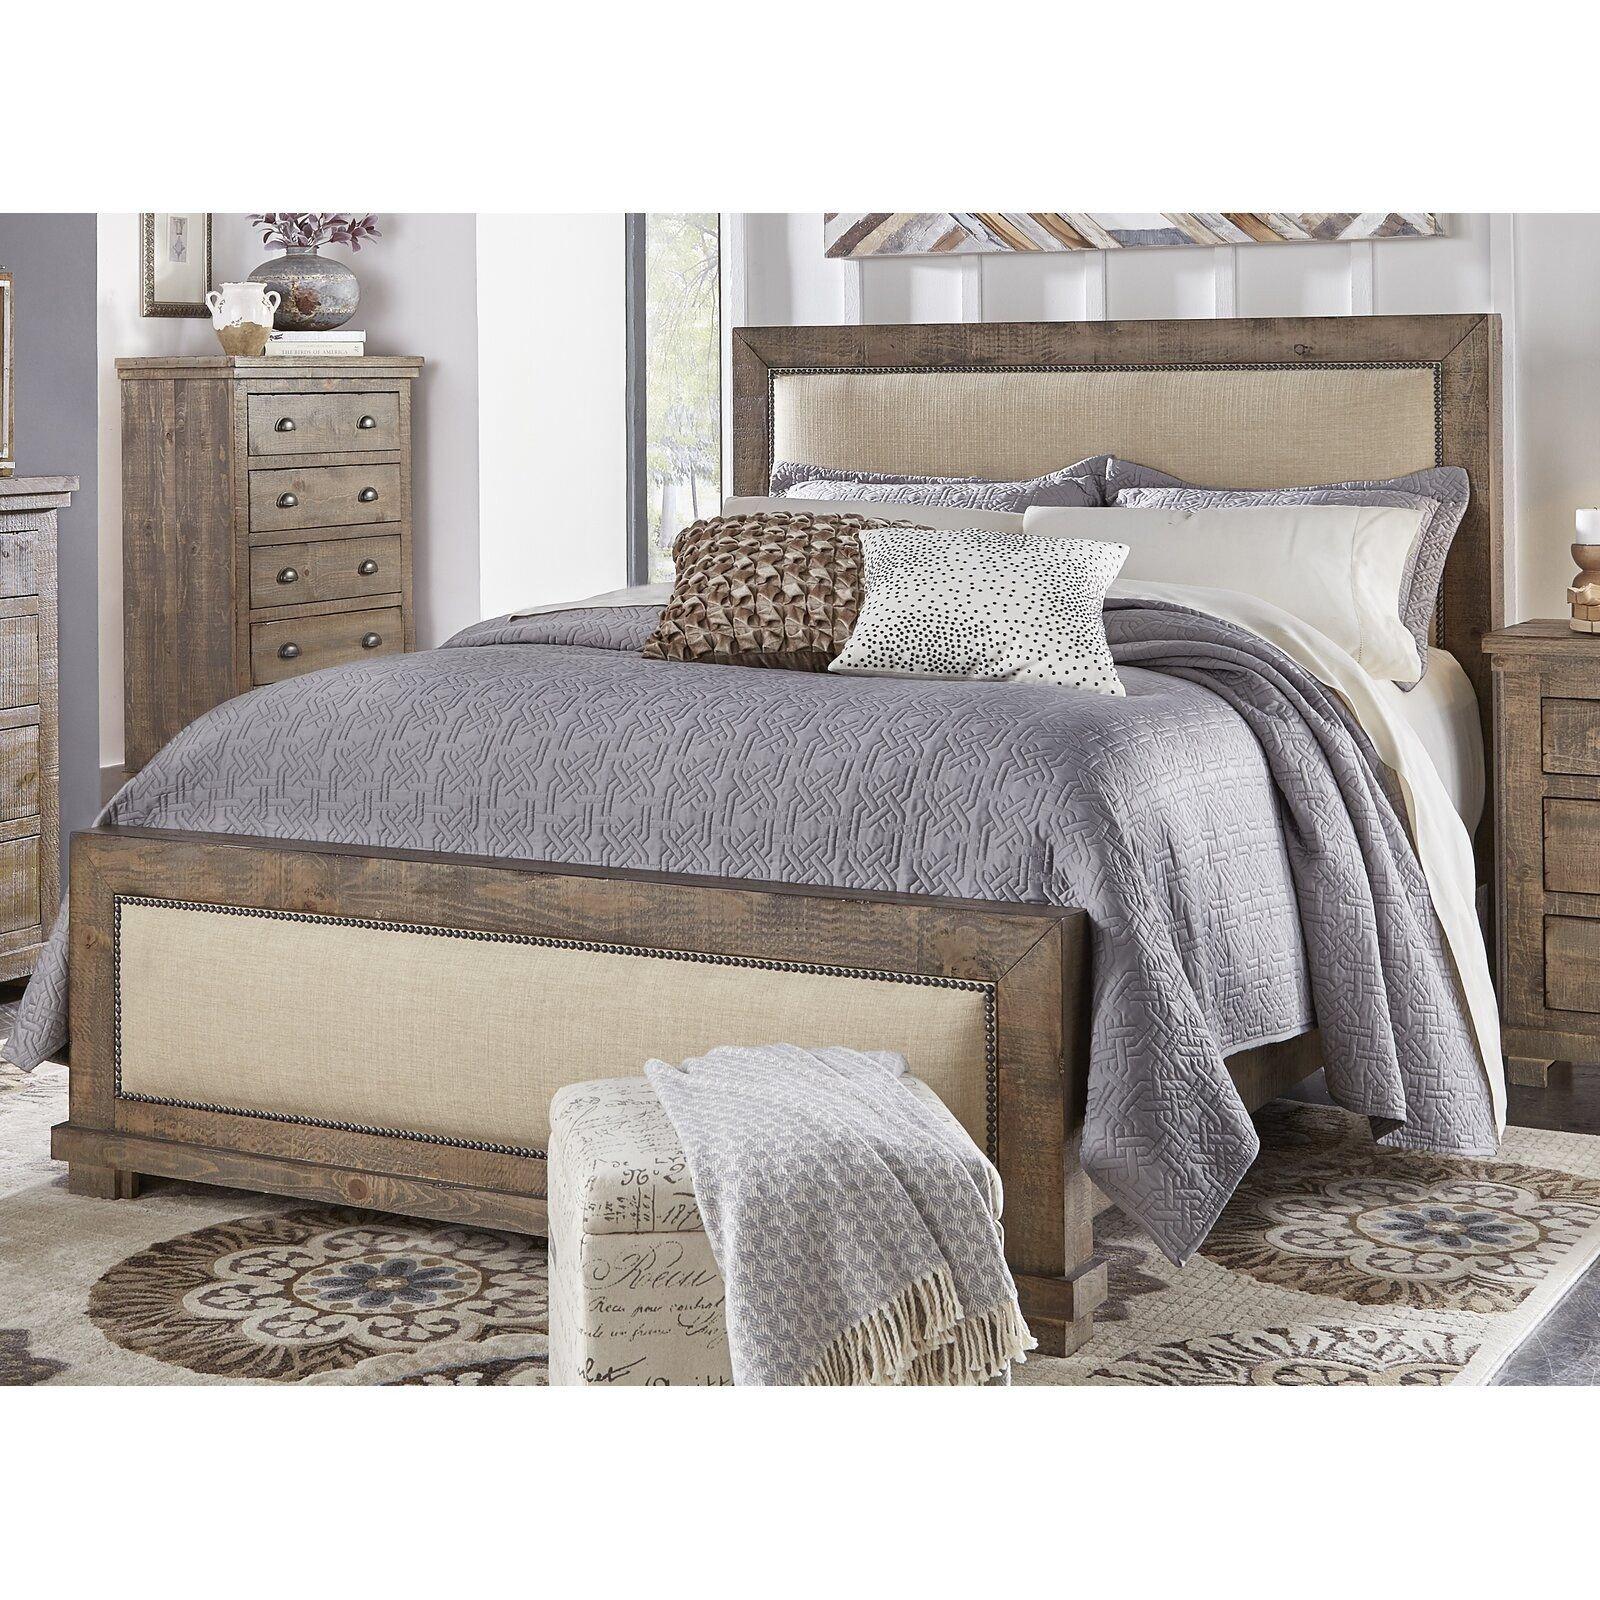 Tufted Headboard Bedroom Set Luxury Castagnier Upholstered Standard Bed In 2019